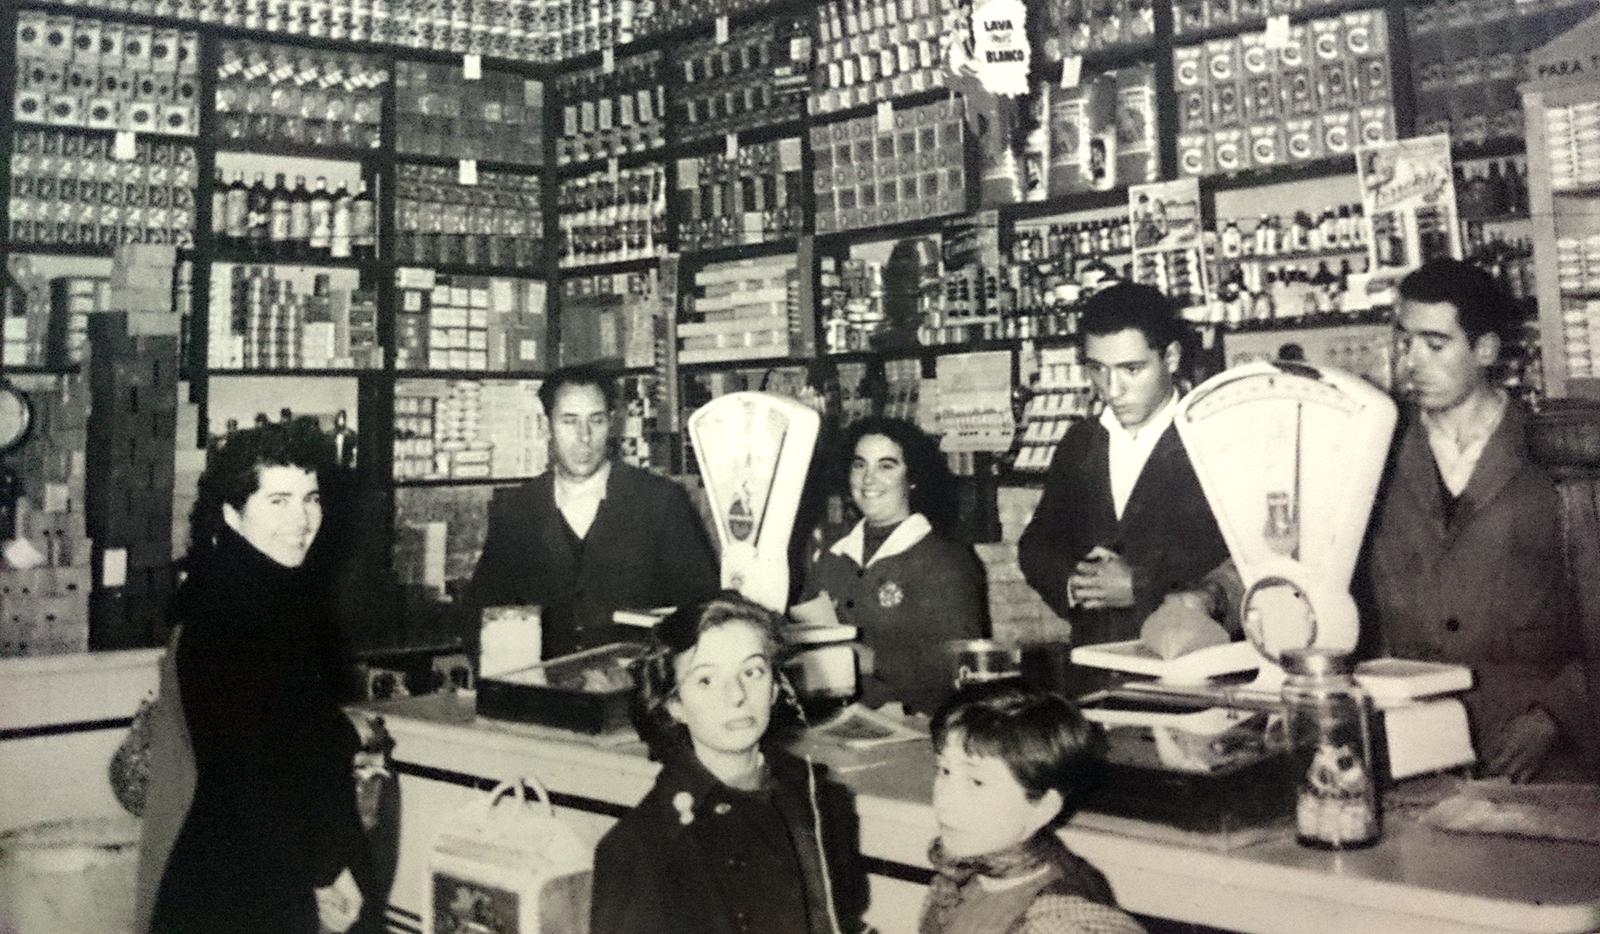 drogueria-barcelona-1951-2_b